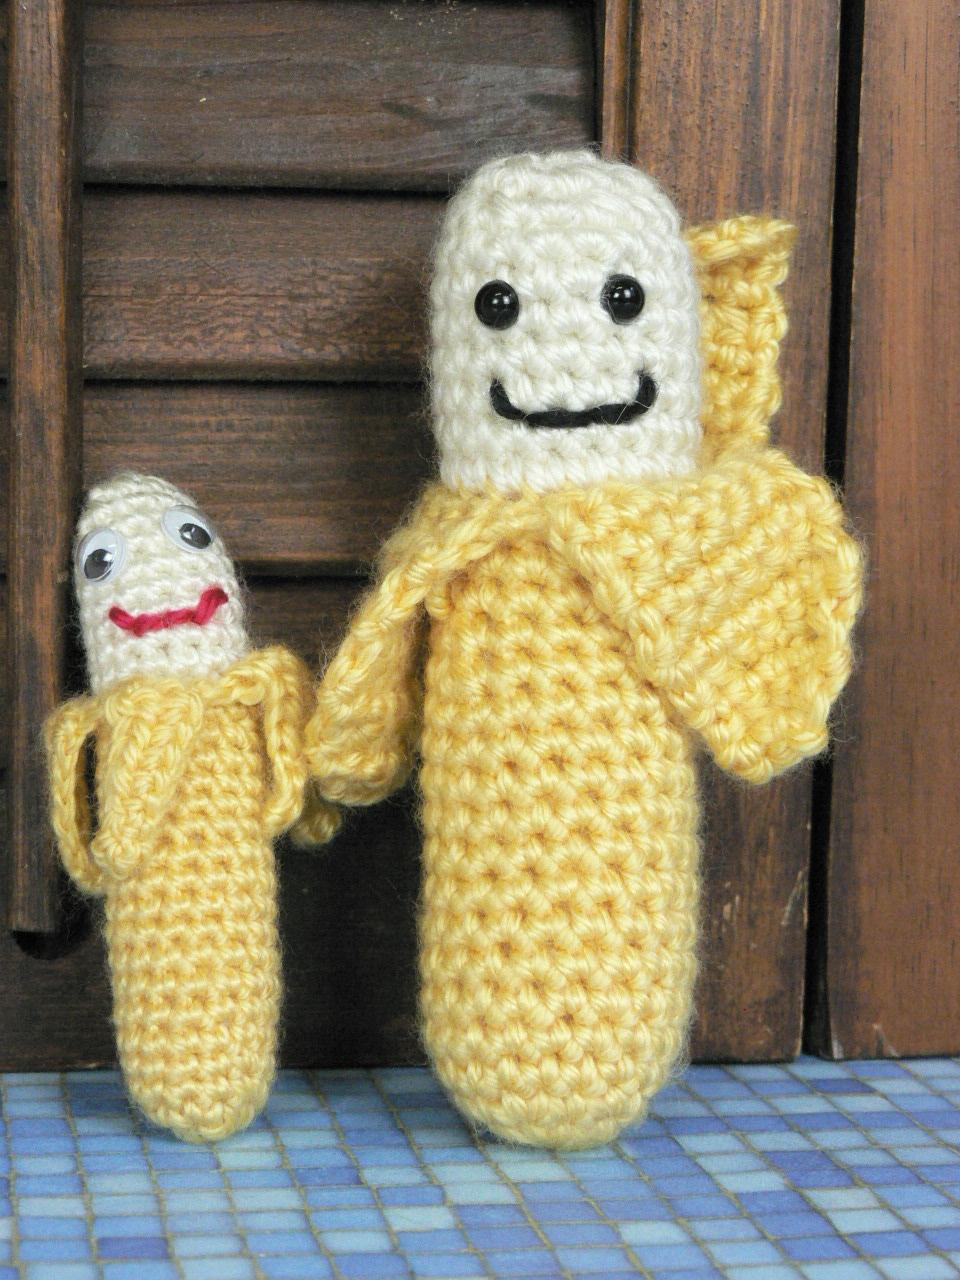 Crocheted Banana by Twinkie Chan - Creativebug | 1280x960